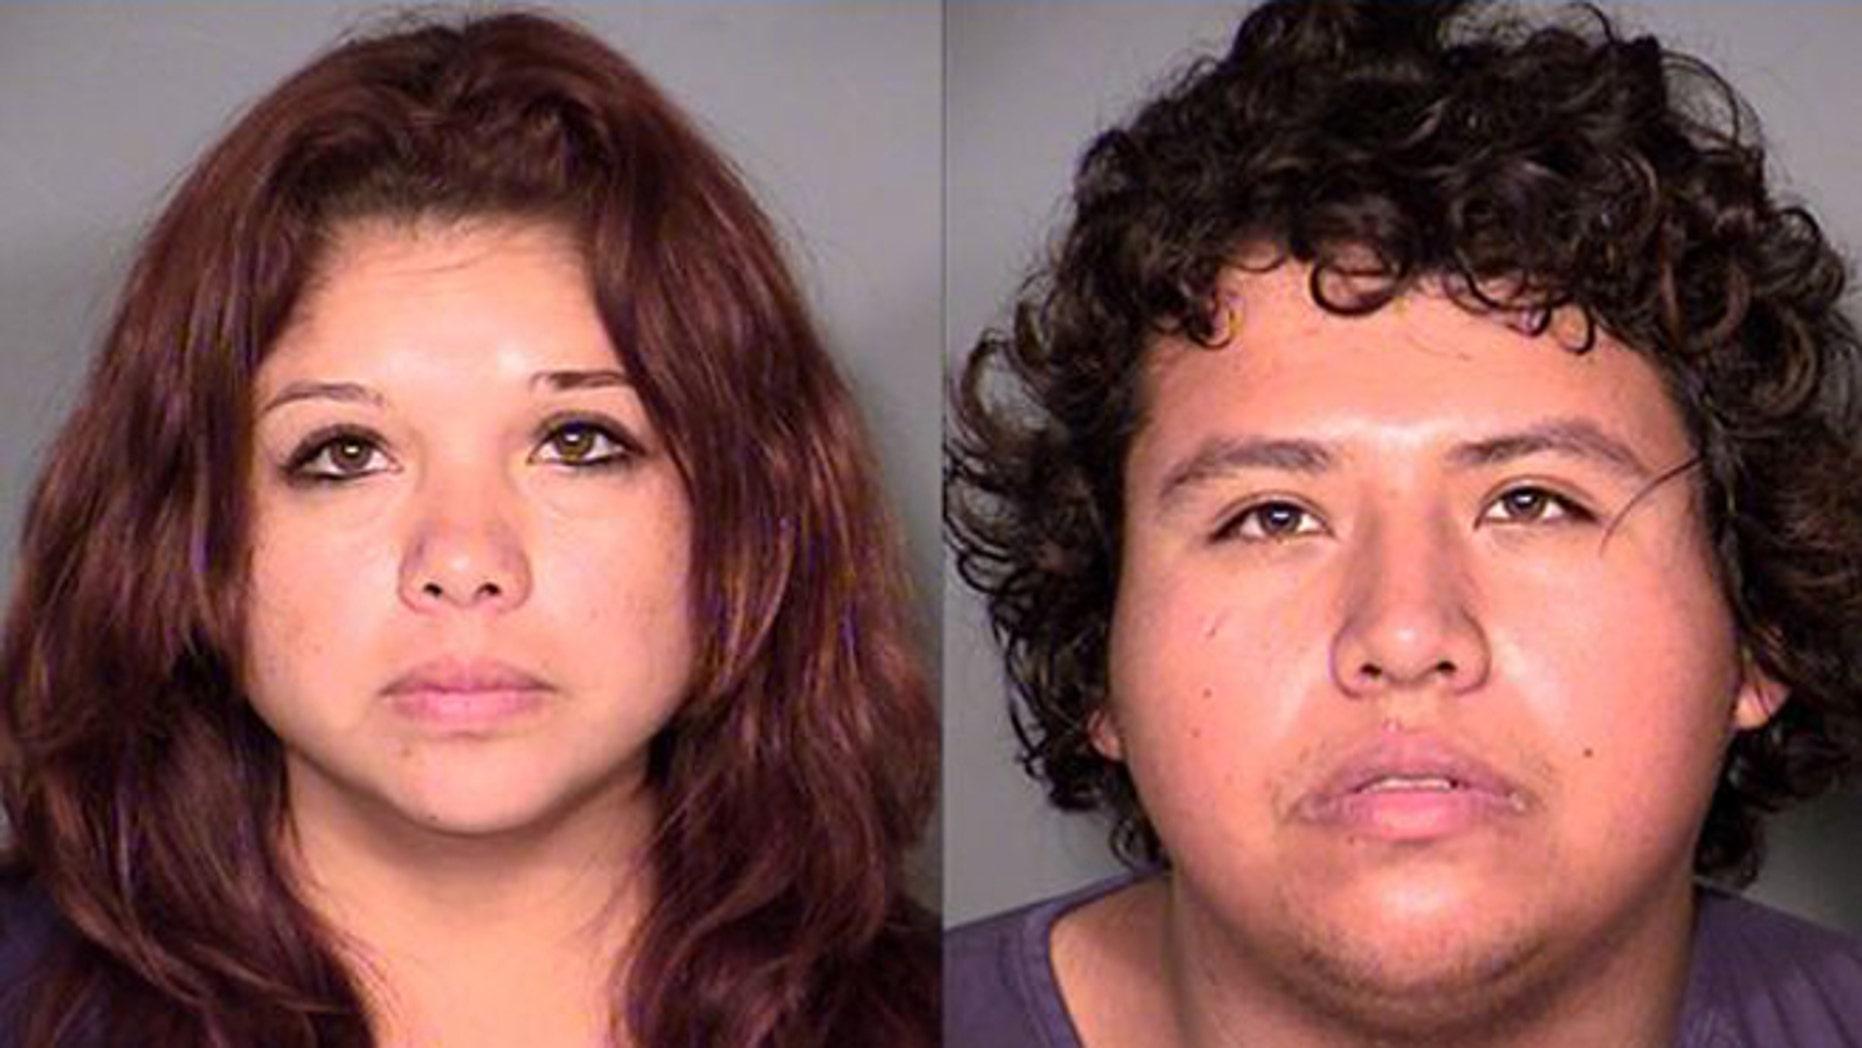 Maria Hernandez and her brother Hector Gutierrez. (Photo: Las Vegas Police Department)